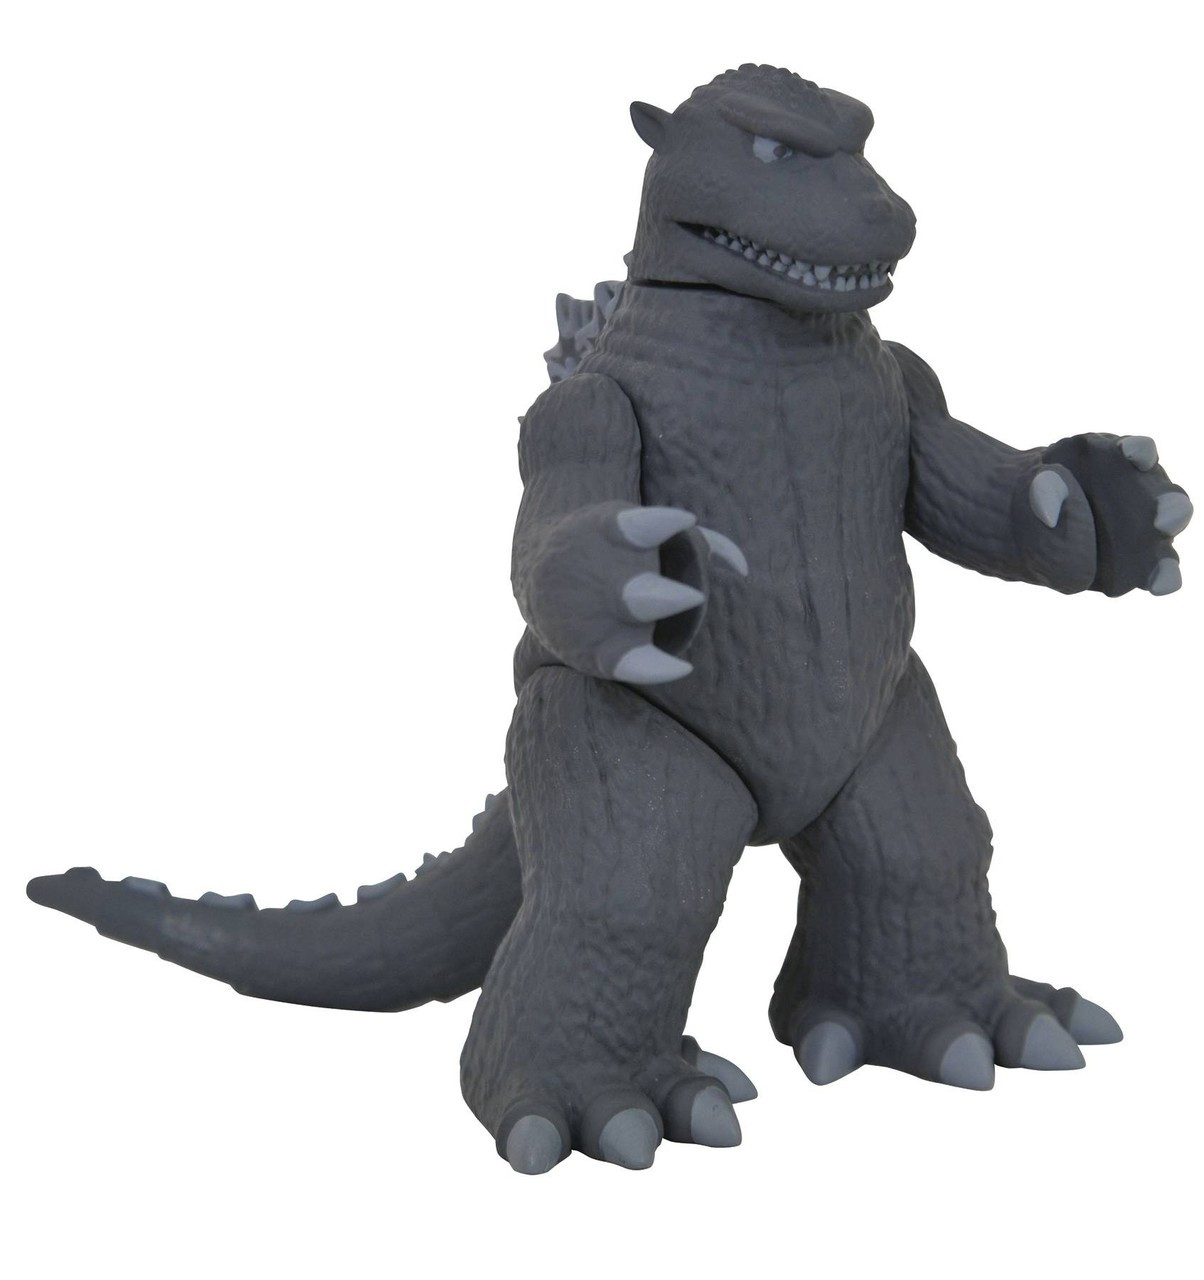 Godzilla 1954 Vinimate Godzilla 4 Collectible Vinyl Figure